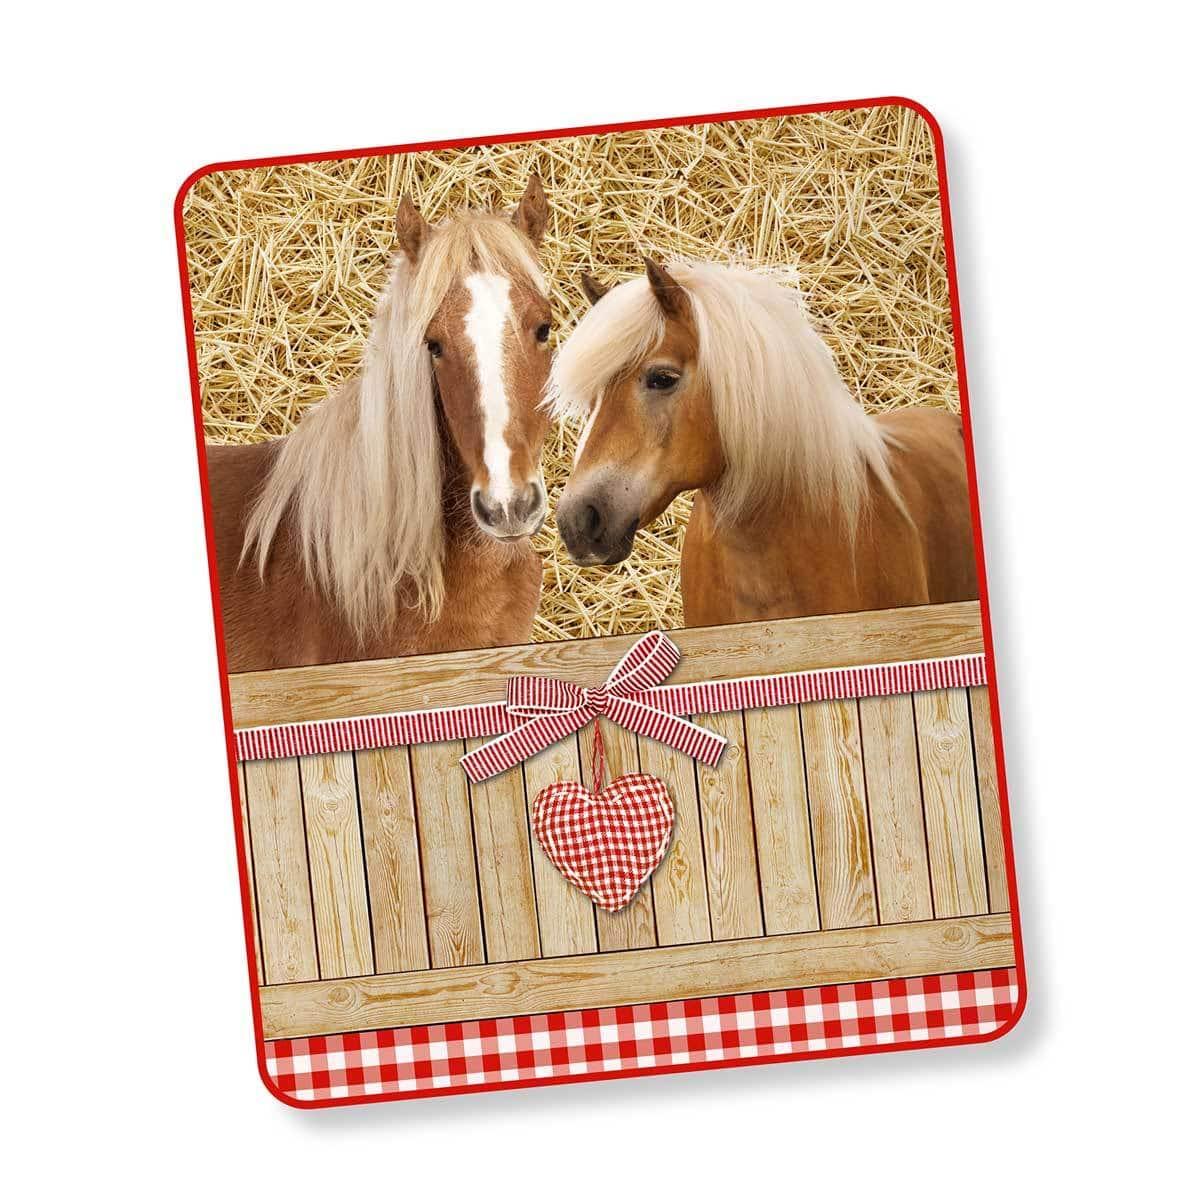 good morning fleecedecke wendeplaid pferde g nstig online kaufen bei bettwaren shop. Black Bedroom Furniture Sets. Home Design Ideas